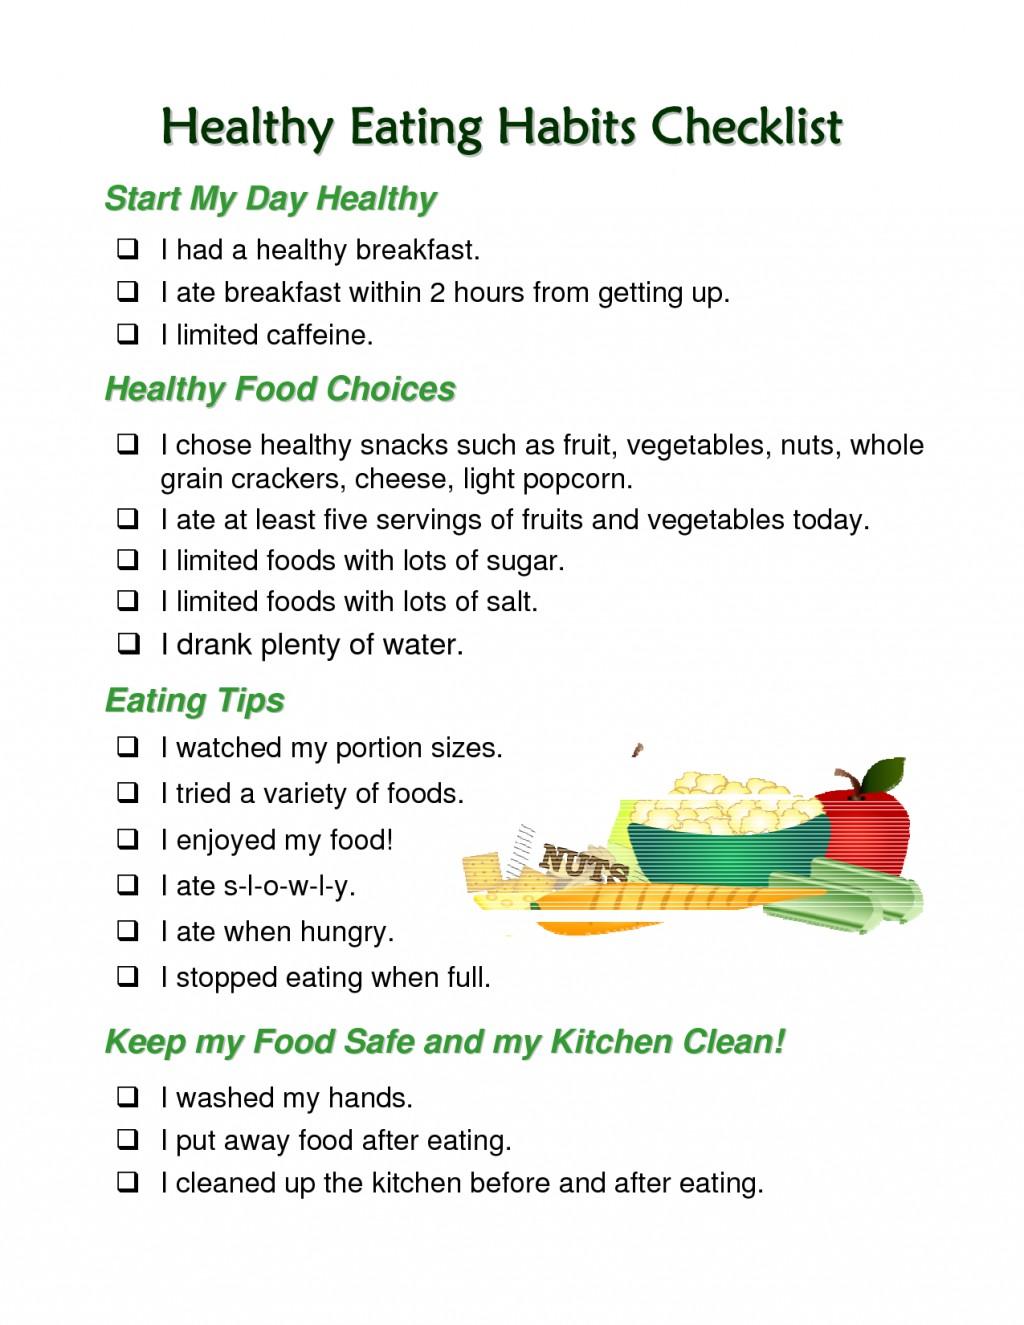 002 Essay Example Healthy Impressive Eating Topics Spm Habits Pdf Large